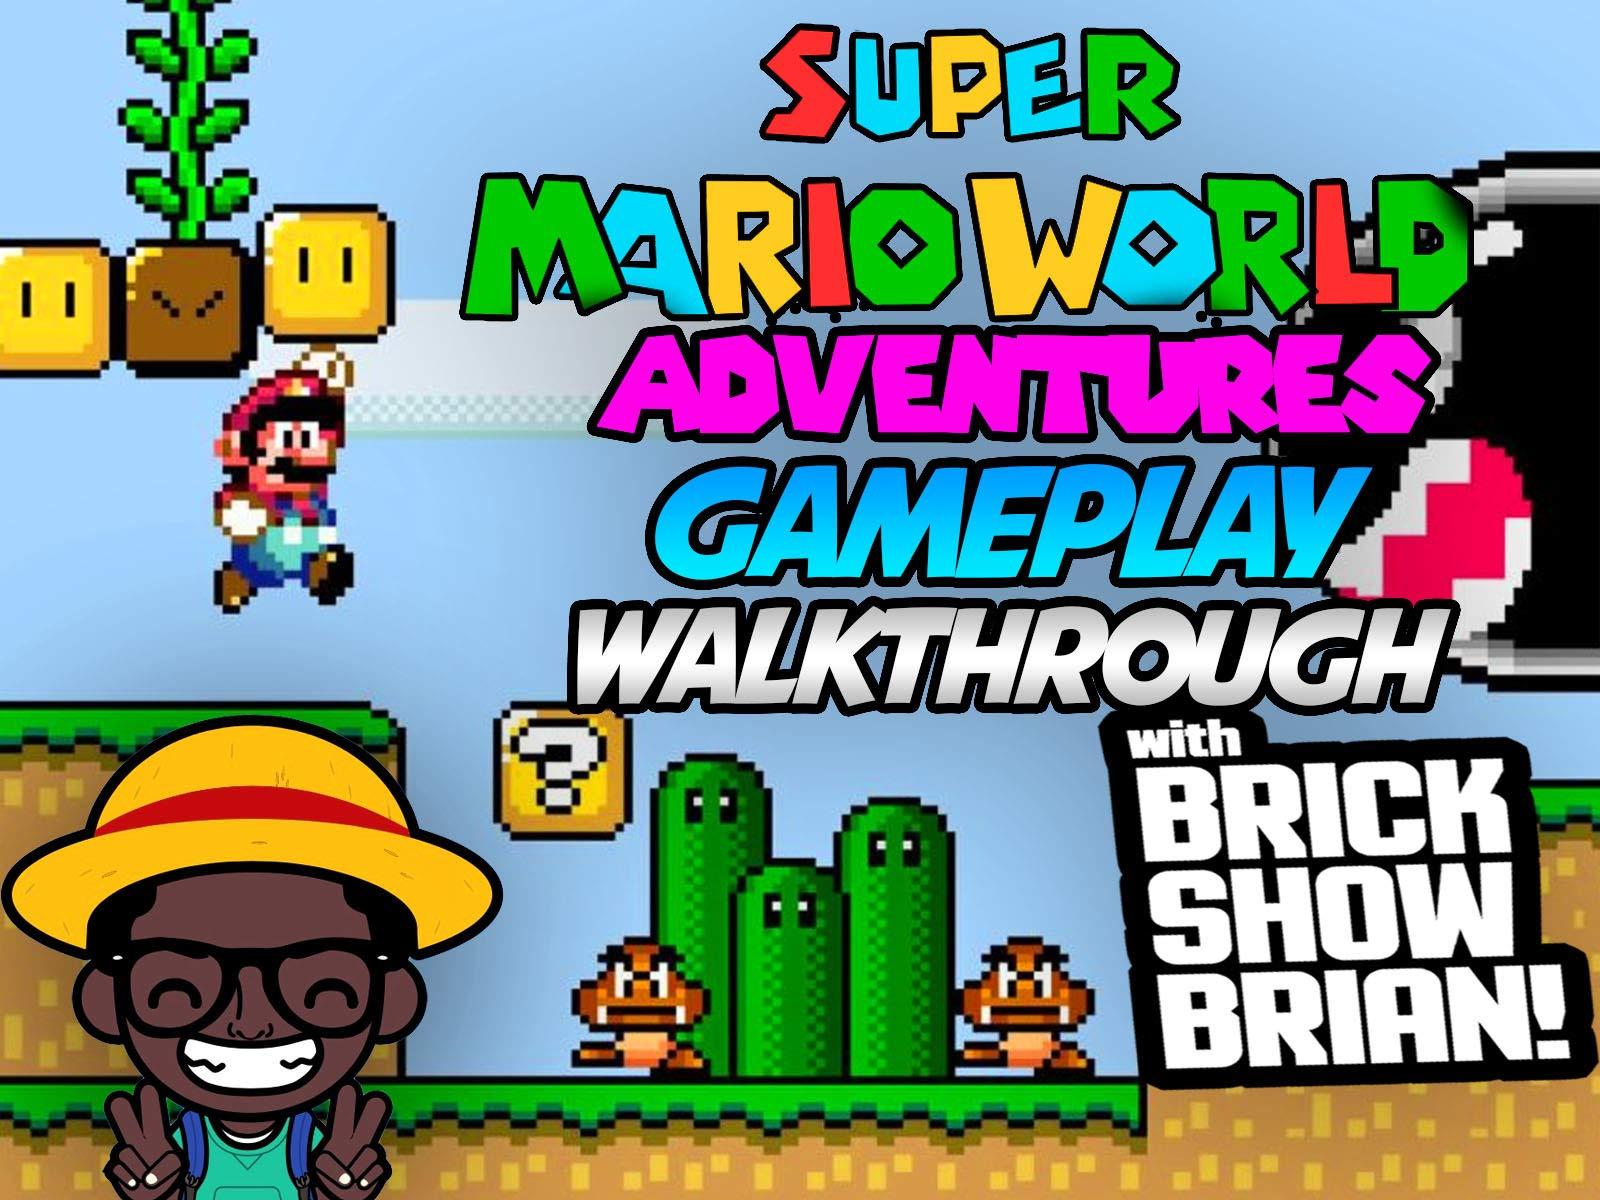 Super Mario World Adventures Gameplay Walkthrough With Brick Show Brian - Season 1